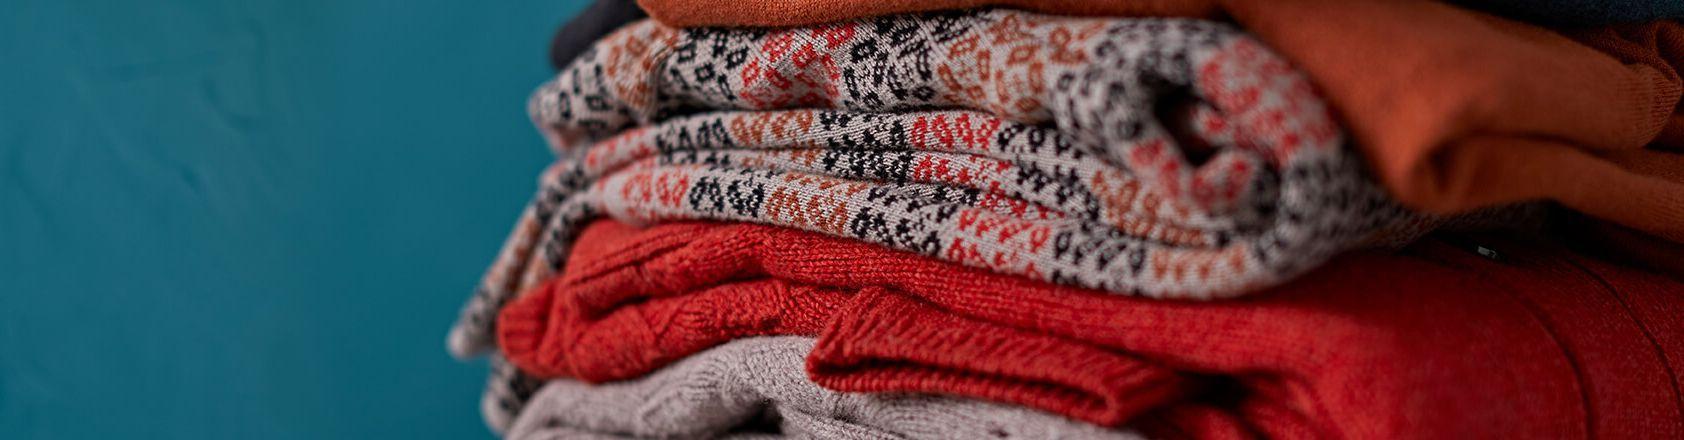 Calcetines de lana para pies fríos